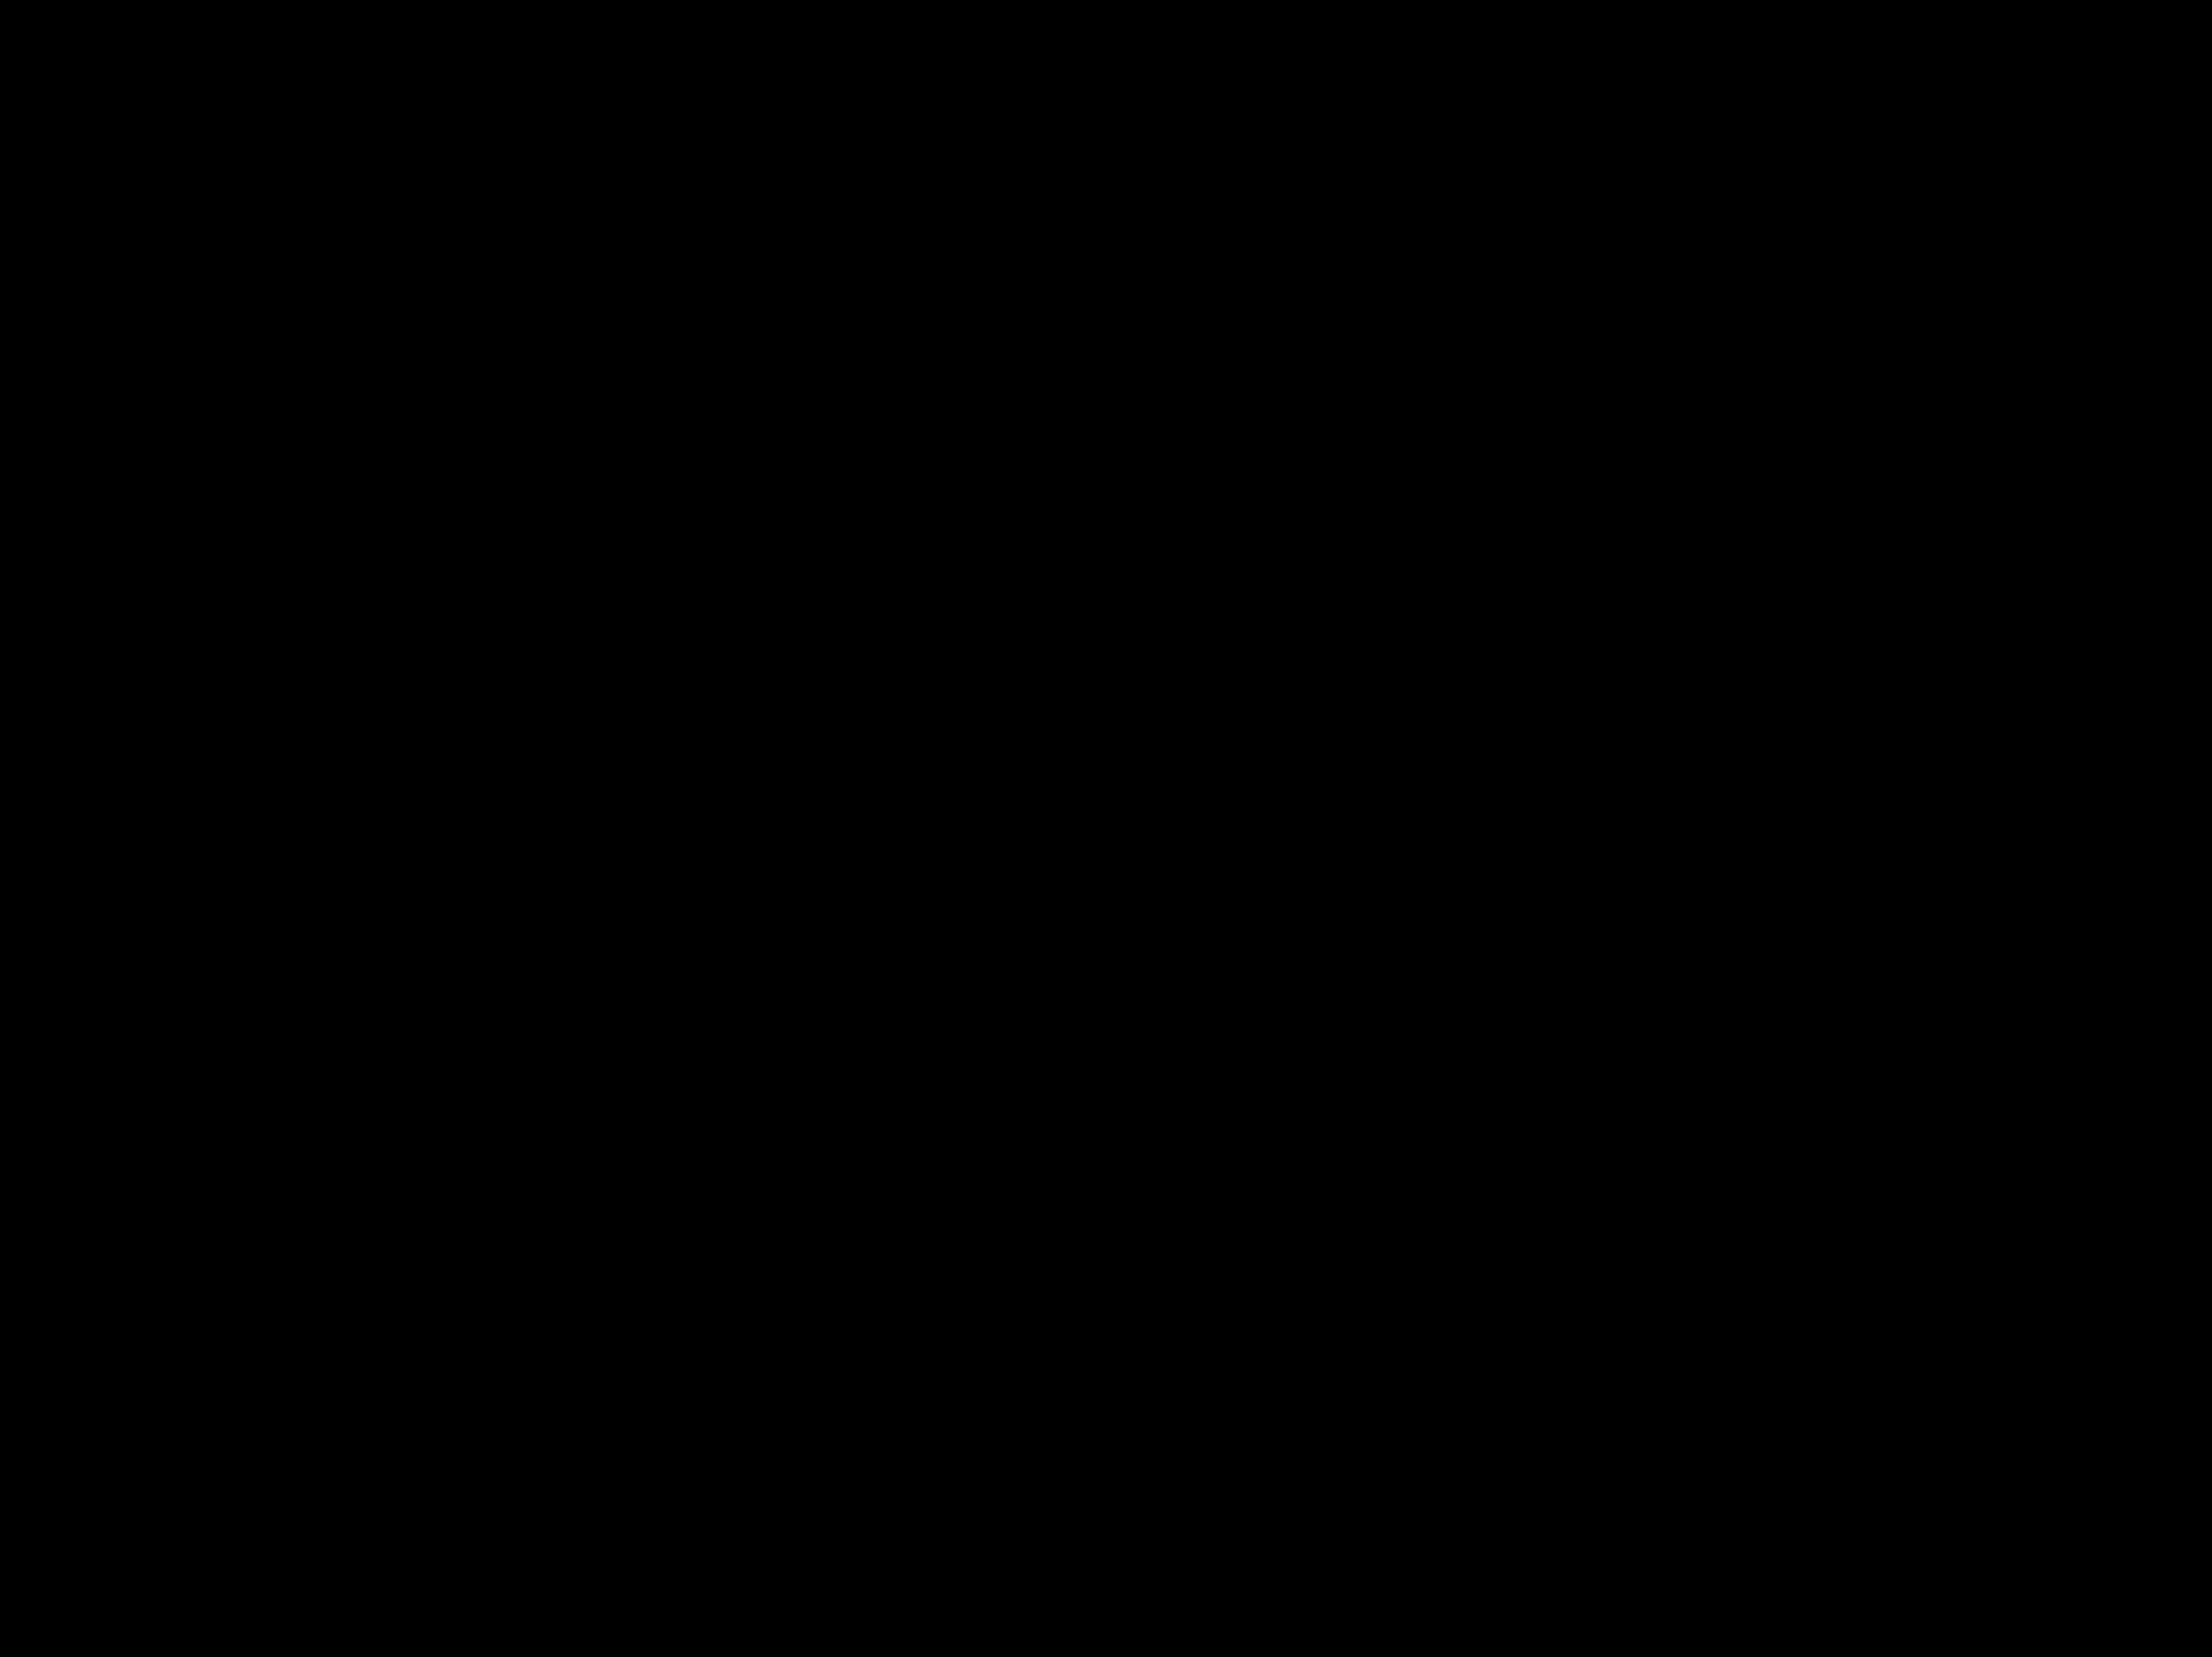 TF1 Design